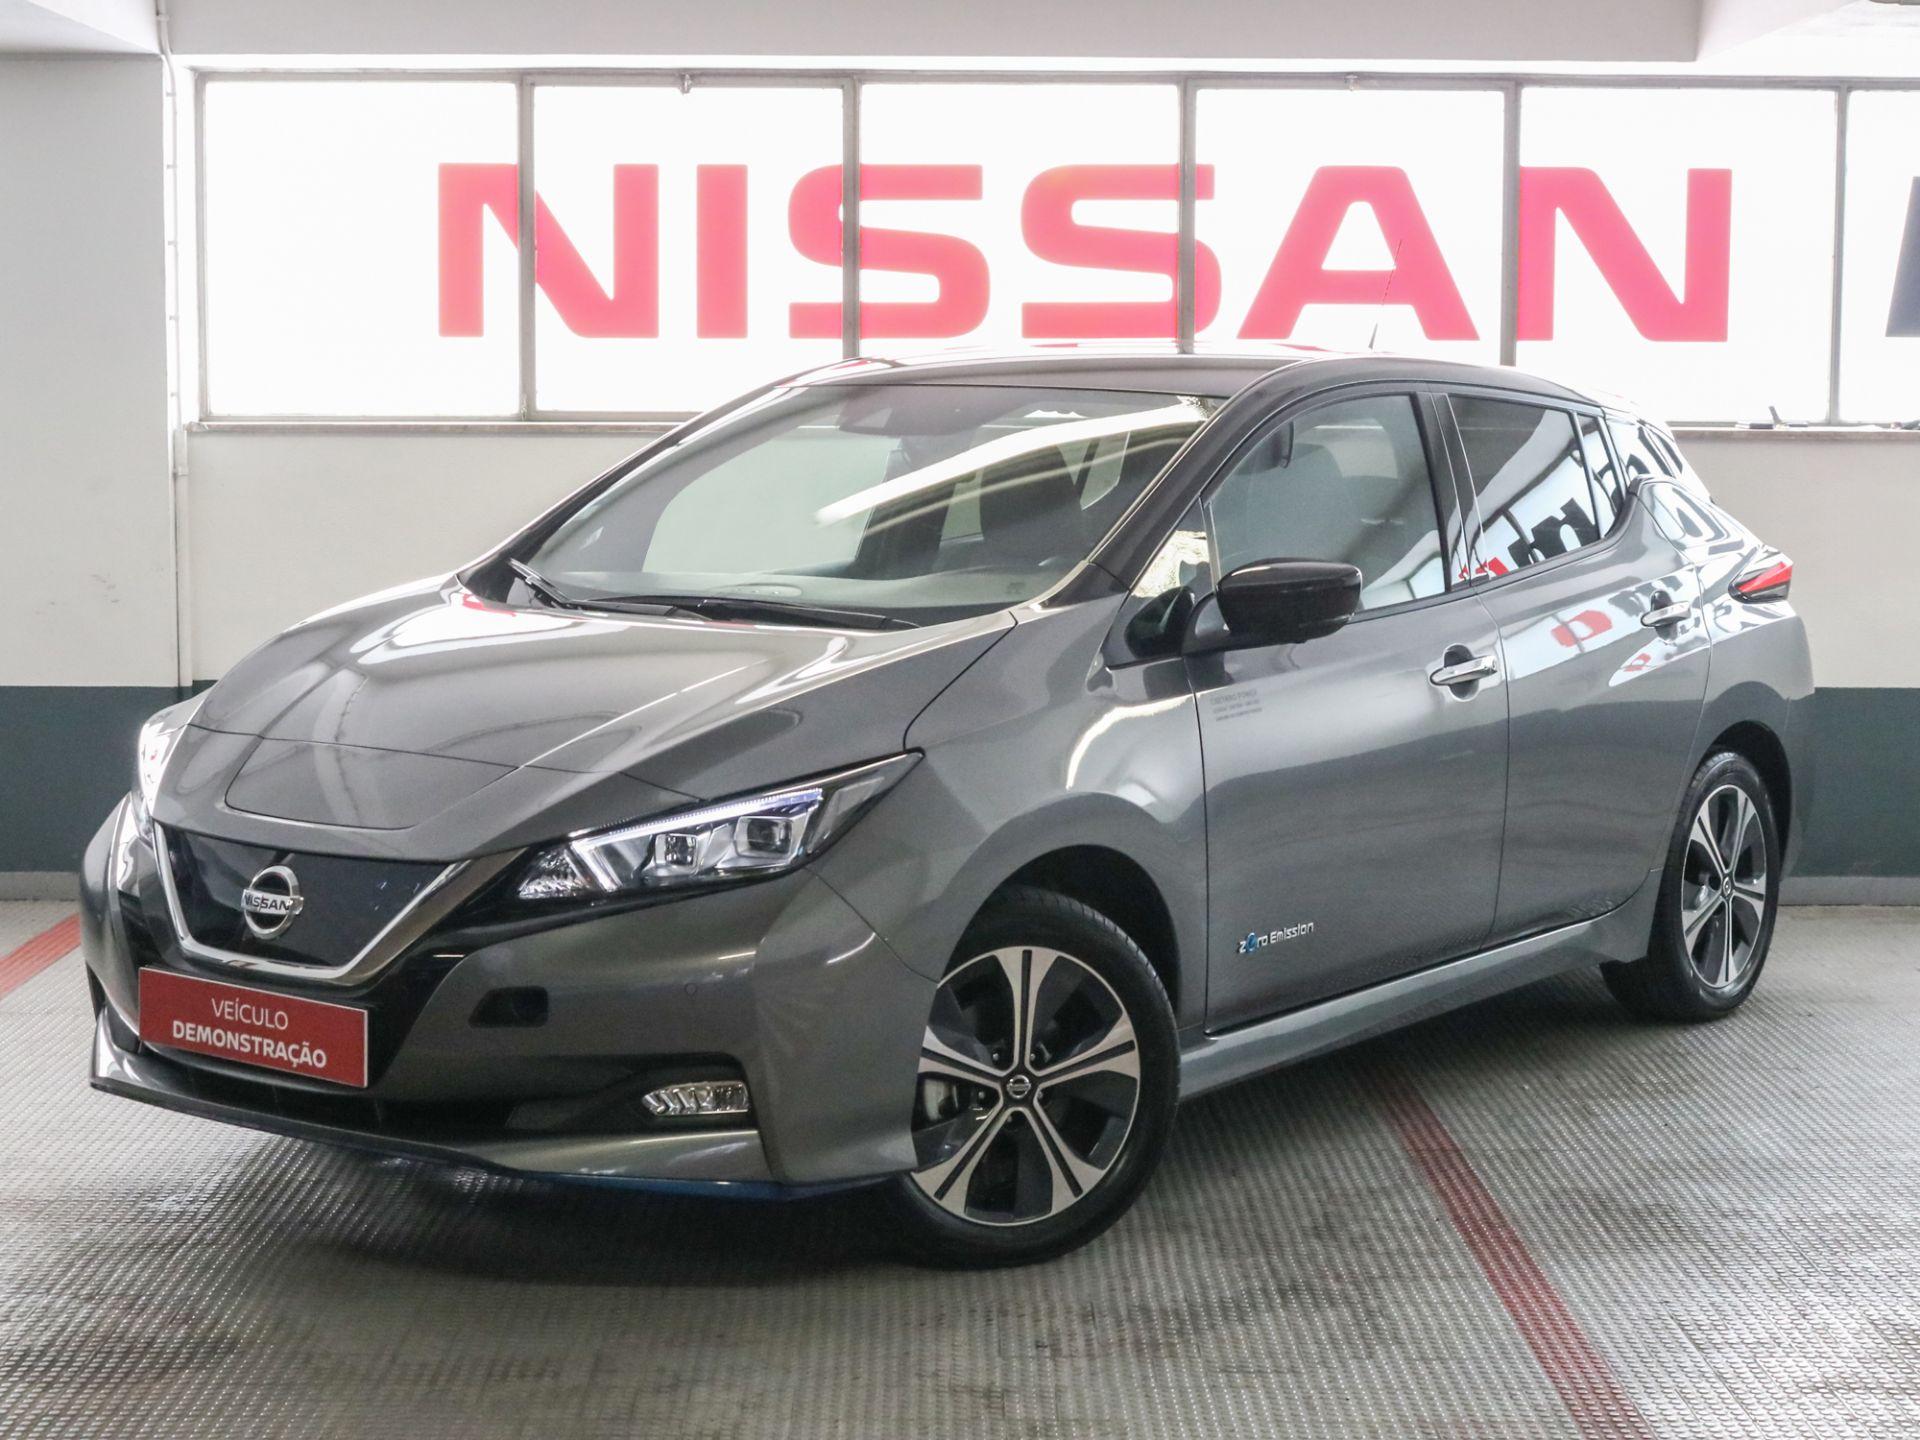 Nissan LEAF LEAF 5p 62 kWh e+ Tekna segunda mão Lisboa